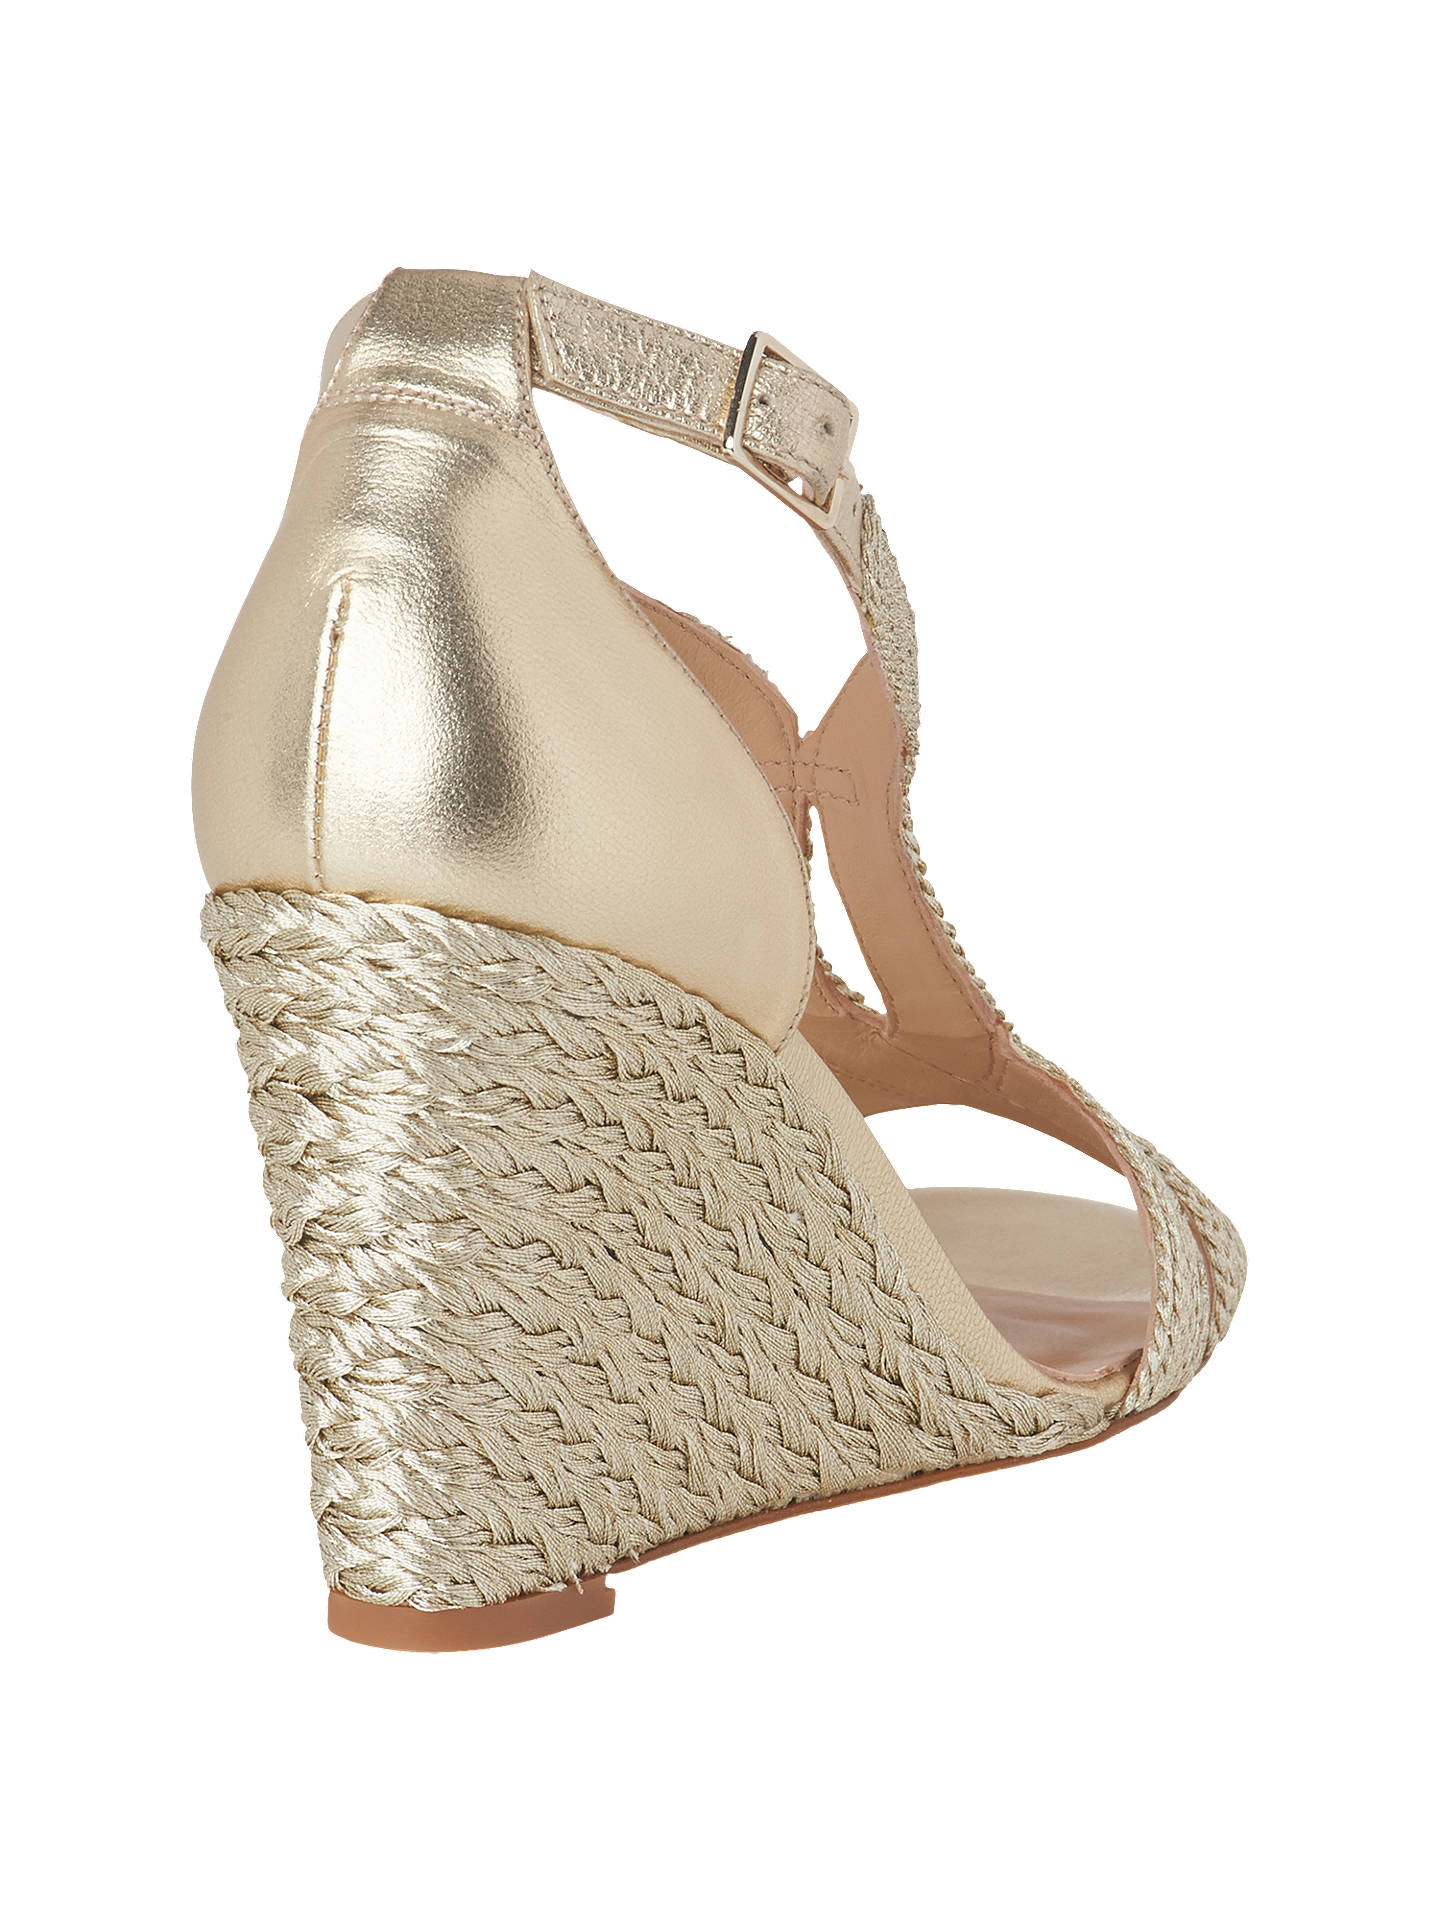 Gold k L Wedge Sandals bennett amp; Partners At John Mali Lewis Soft Heel Sww0Rd